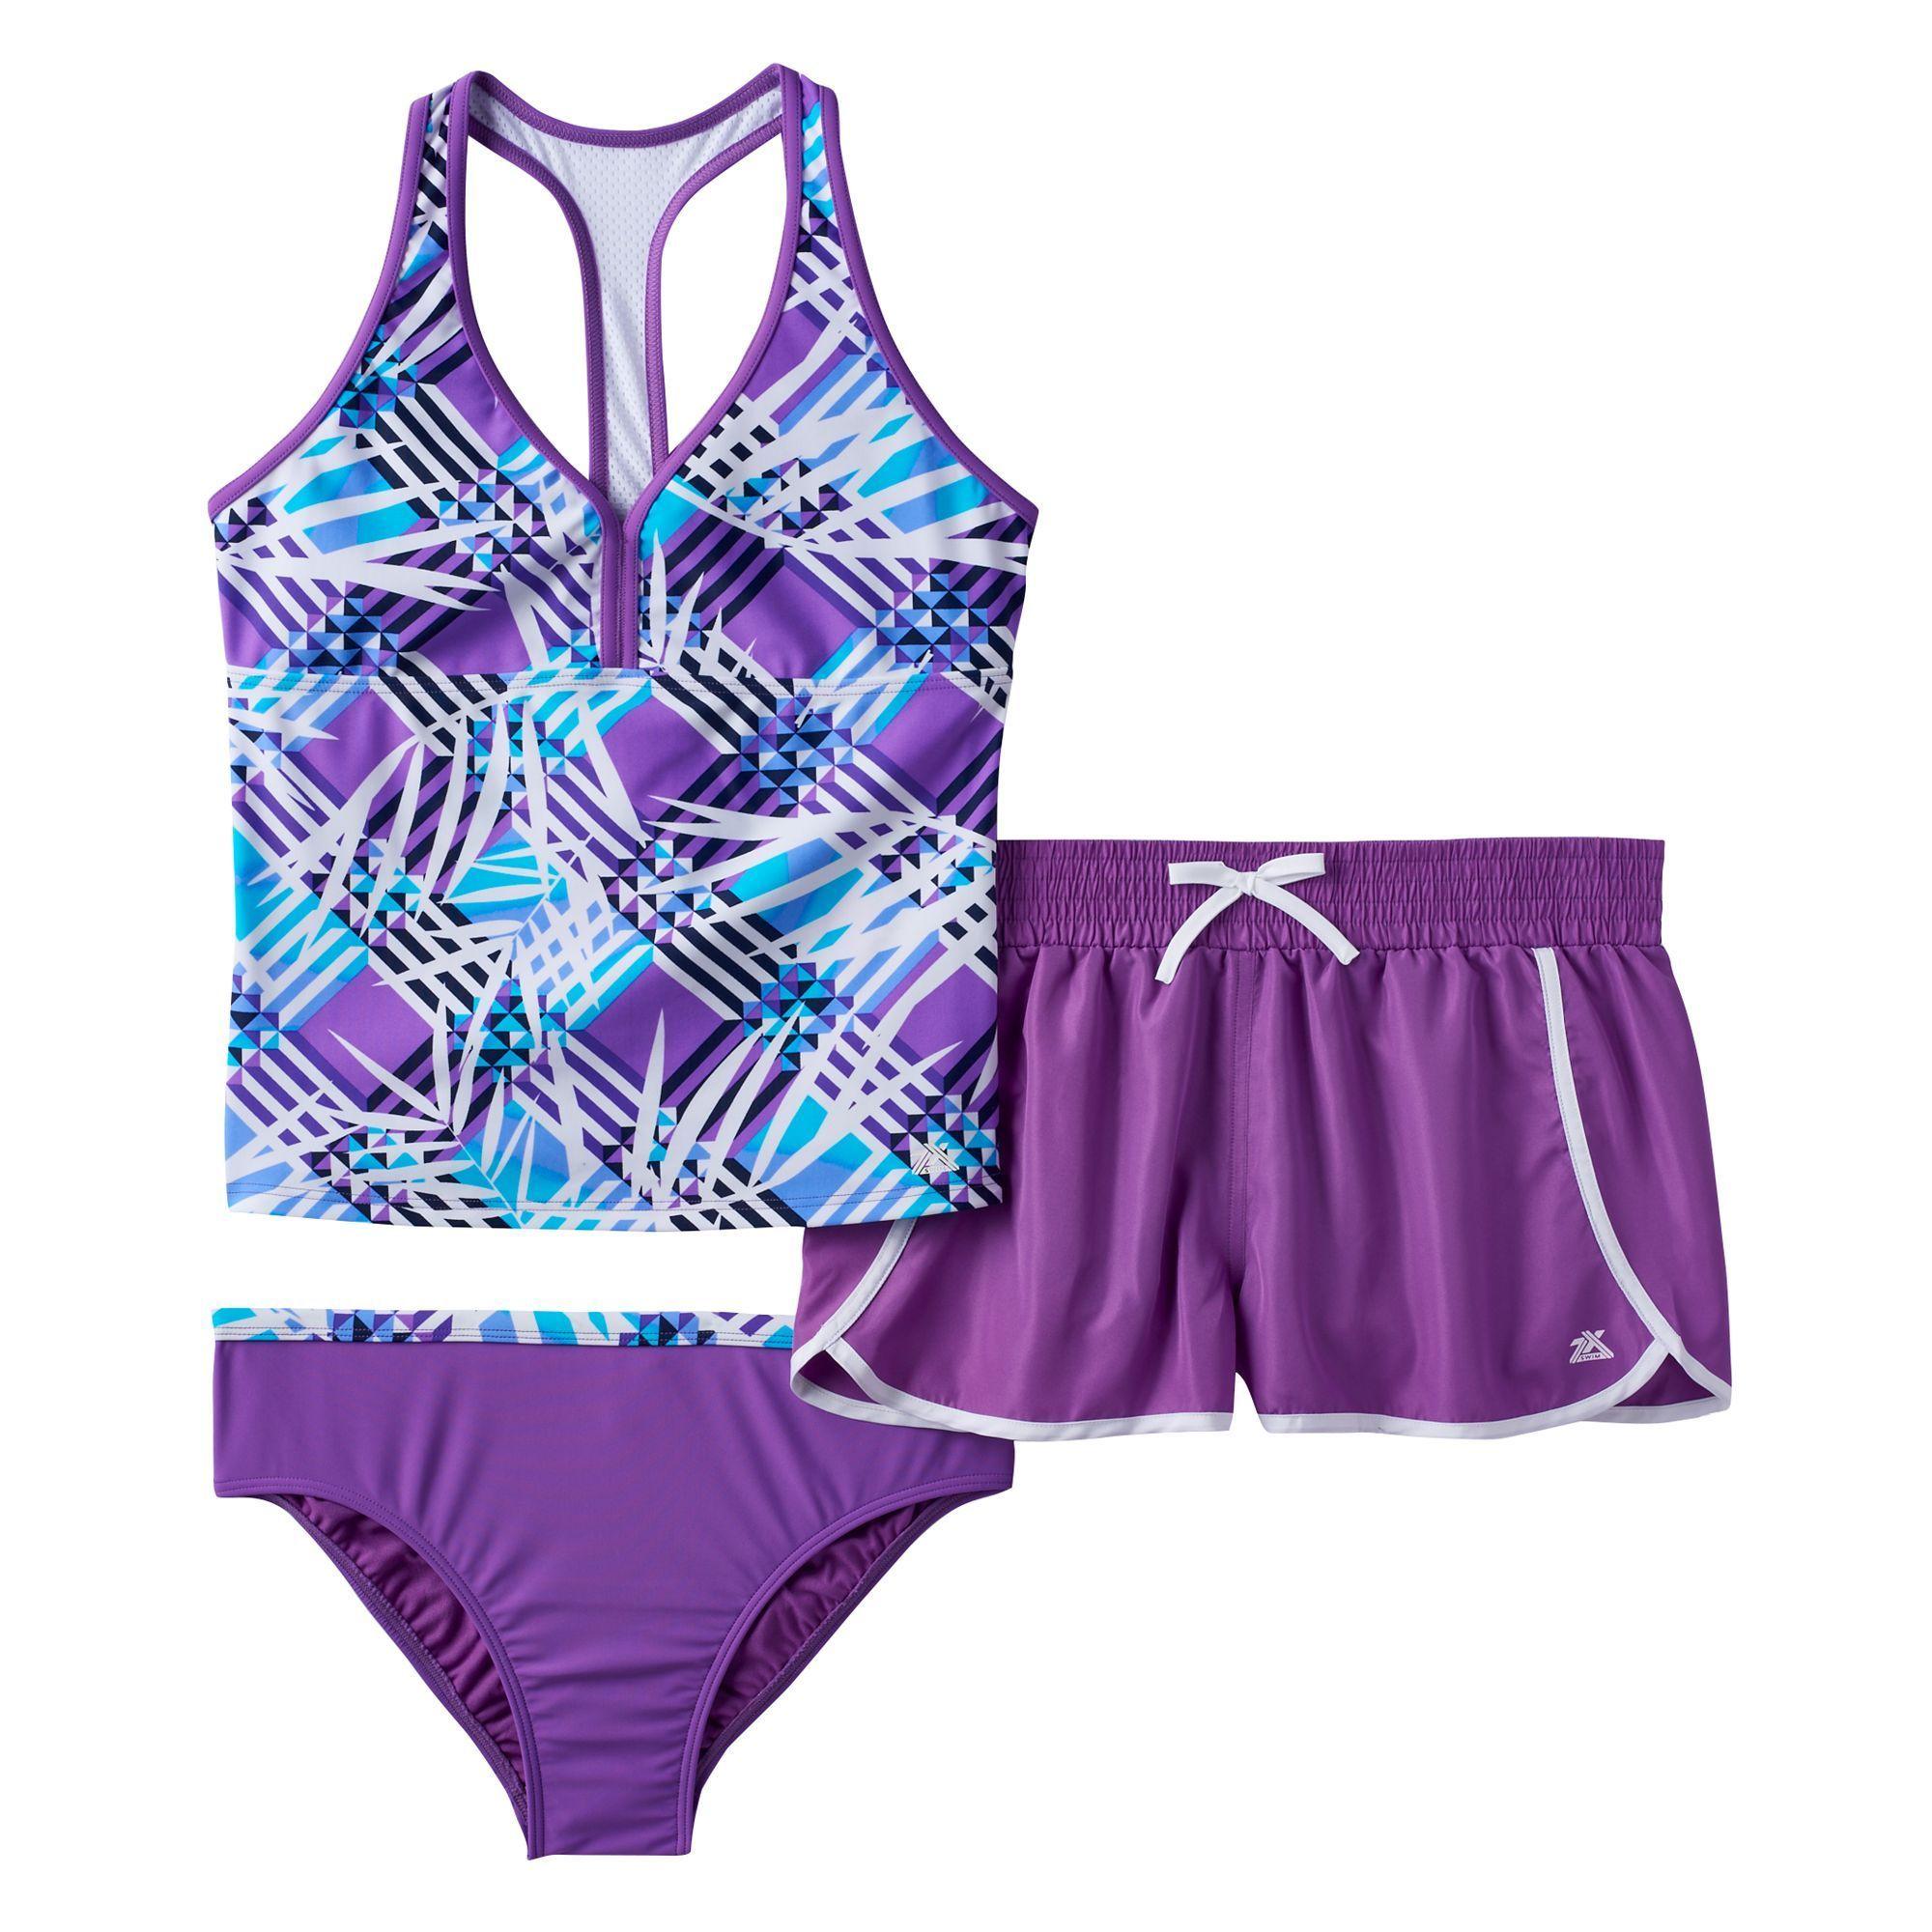 f204cf187d Girls Plus Size ZeroXposur Mesh Racerback Tankini Top, Bottoms & Dolphin  Shorts Swimsuit Set, Size: 16 1/2, Lt Purple